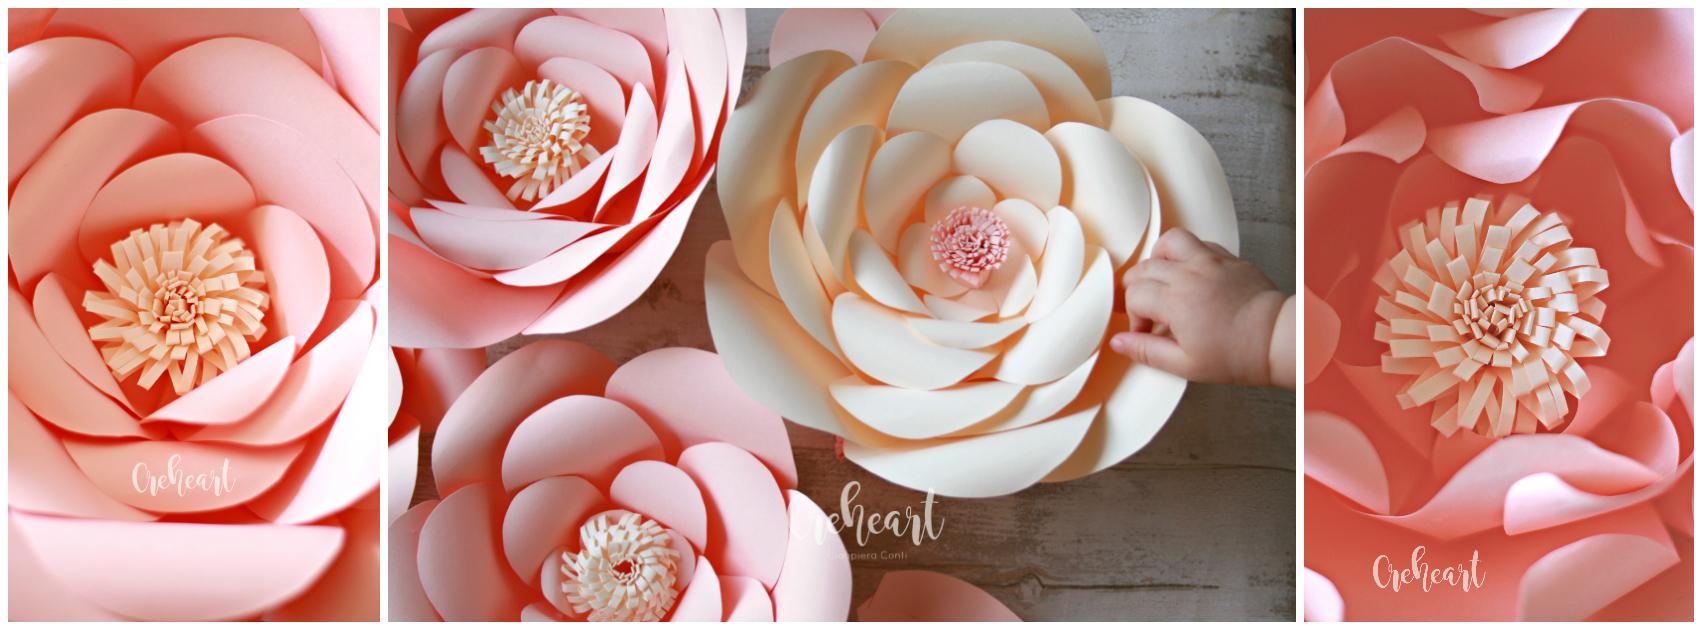 Collage Flowers Creheart.jpg